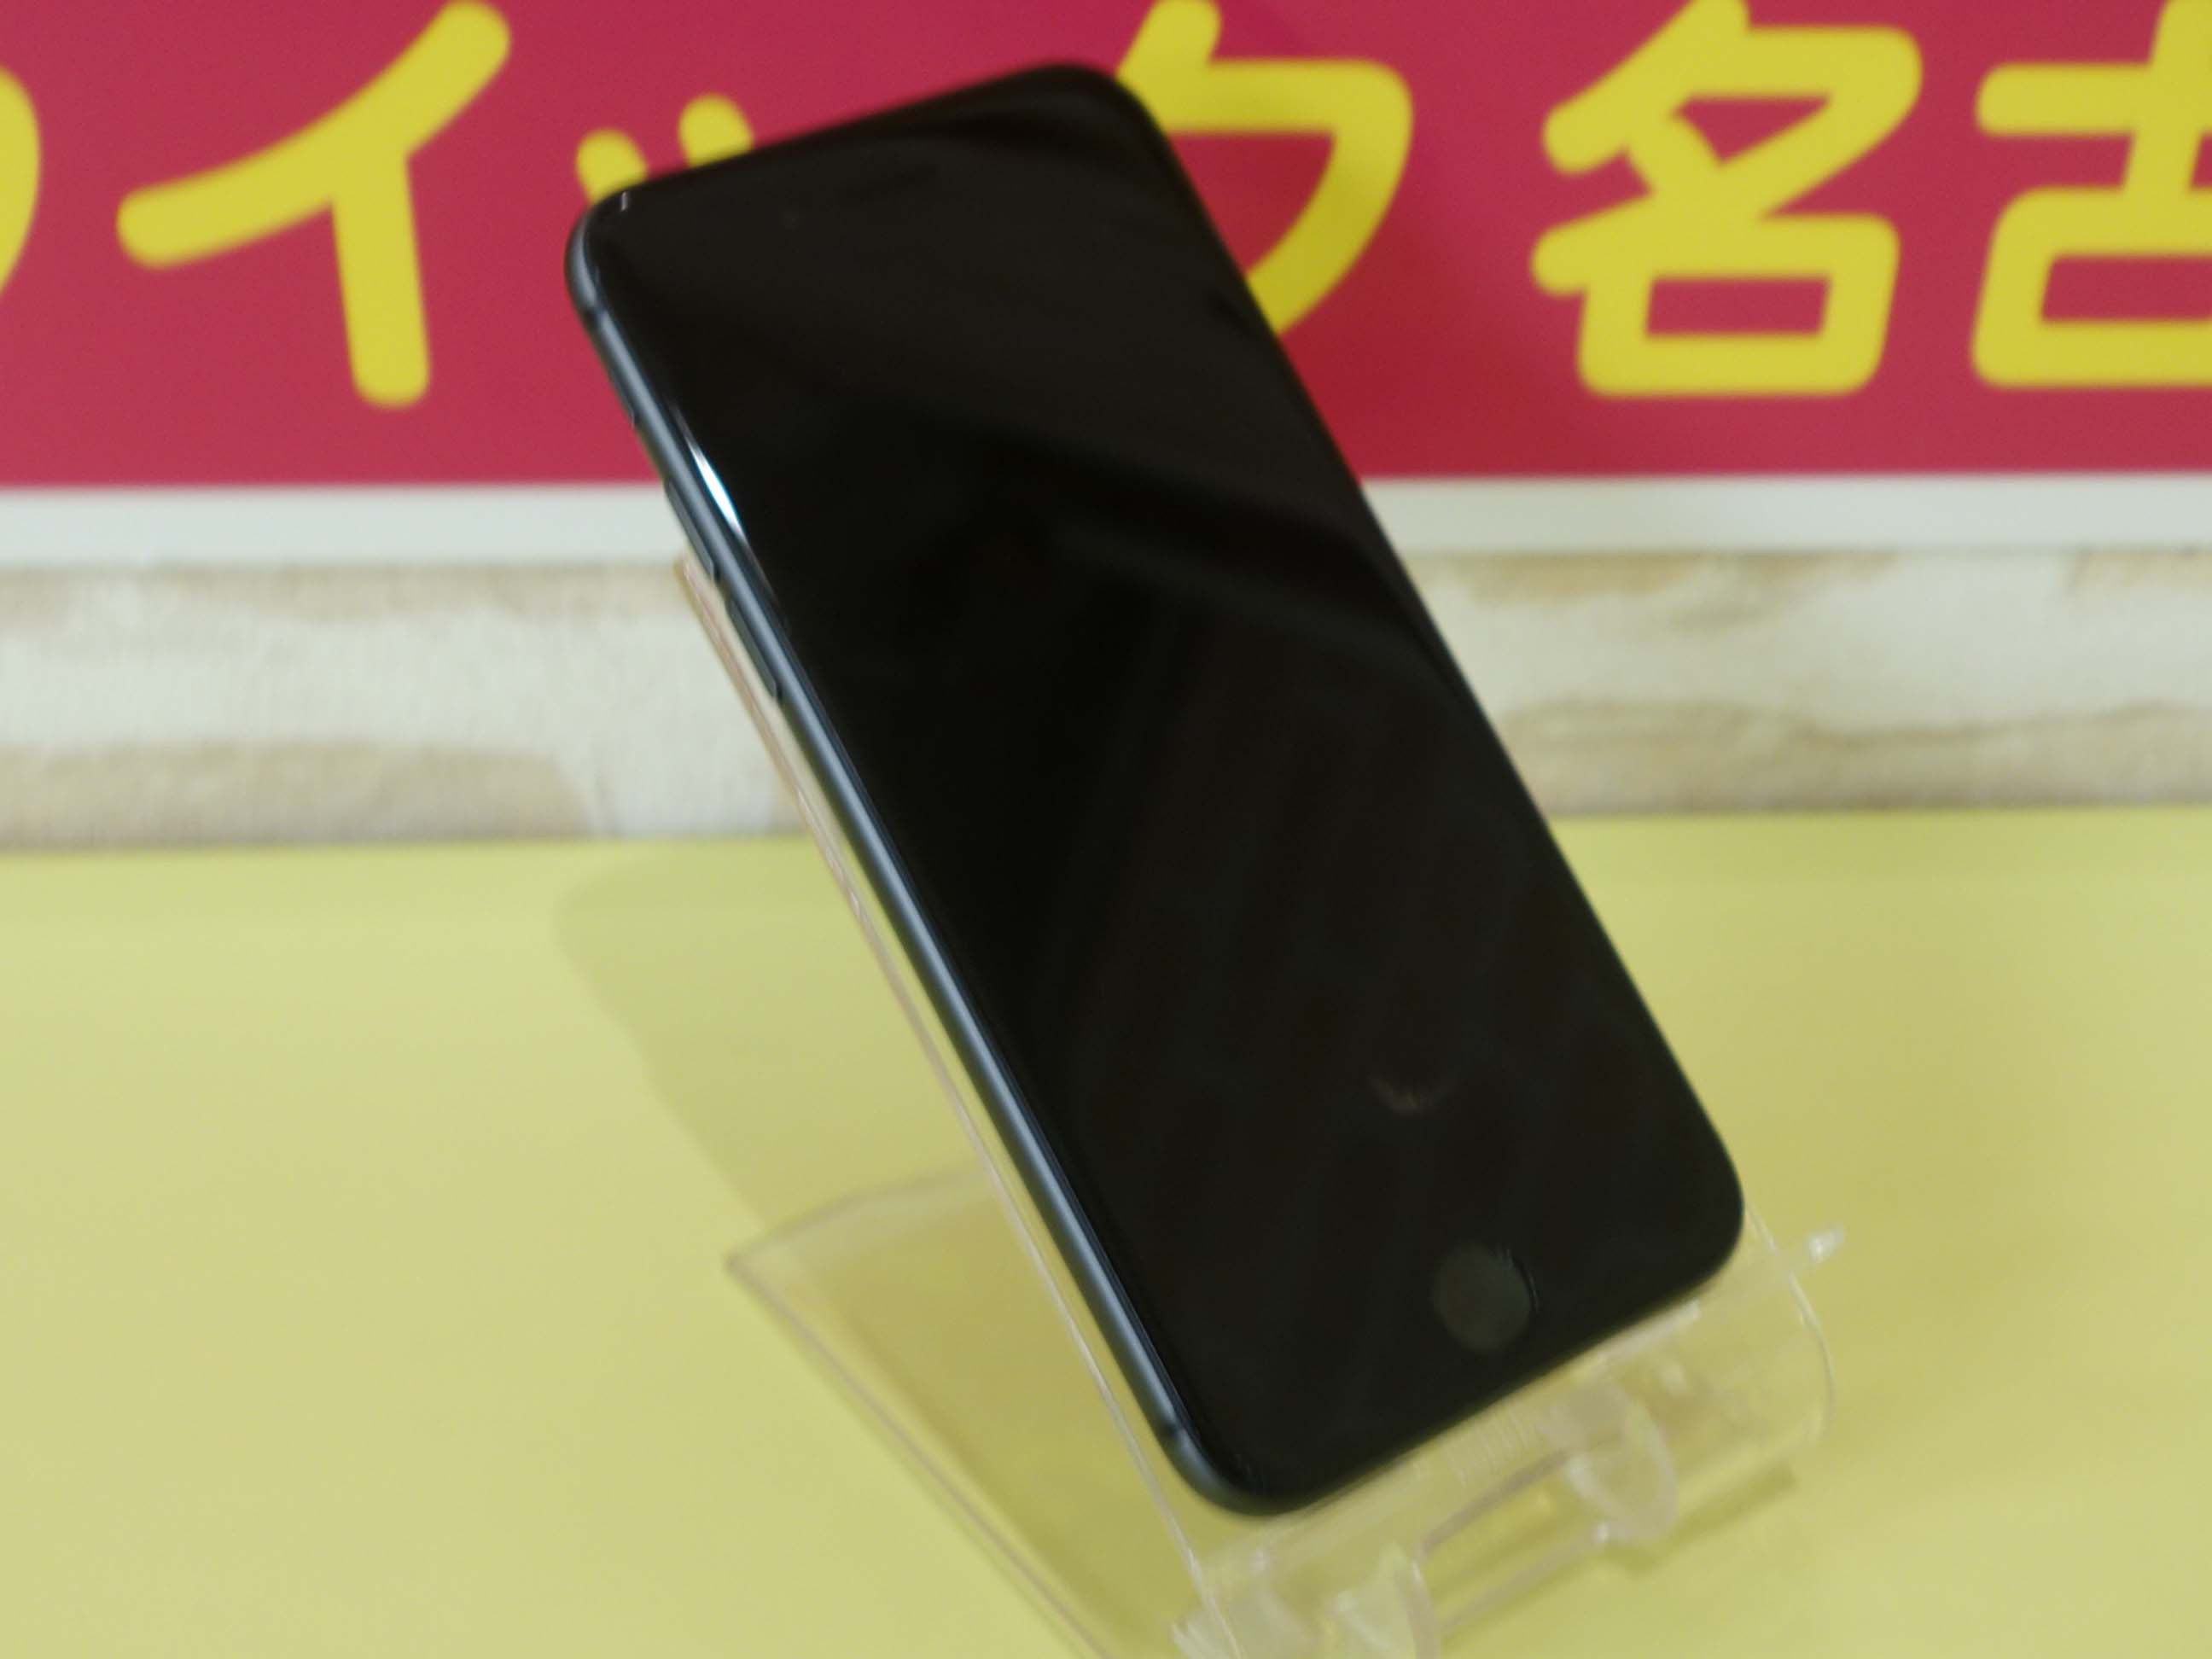 iPhone8の起動不良での基盤修理に大阪府よりご来店!アイフォン修理のクイック名古屋